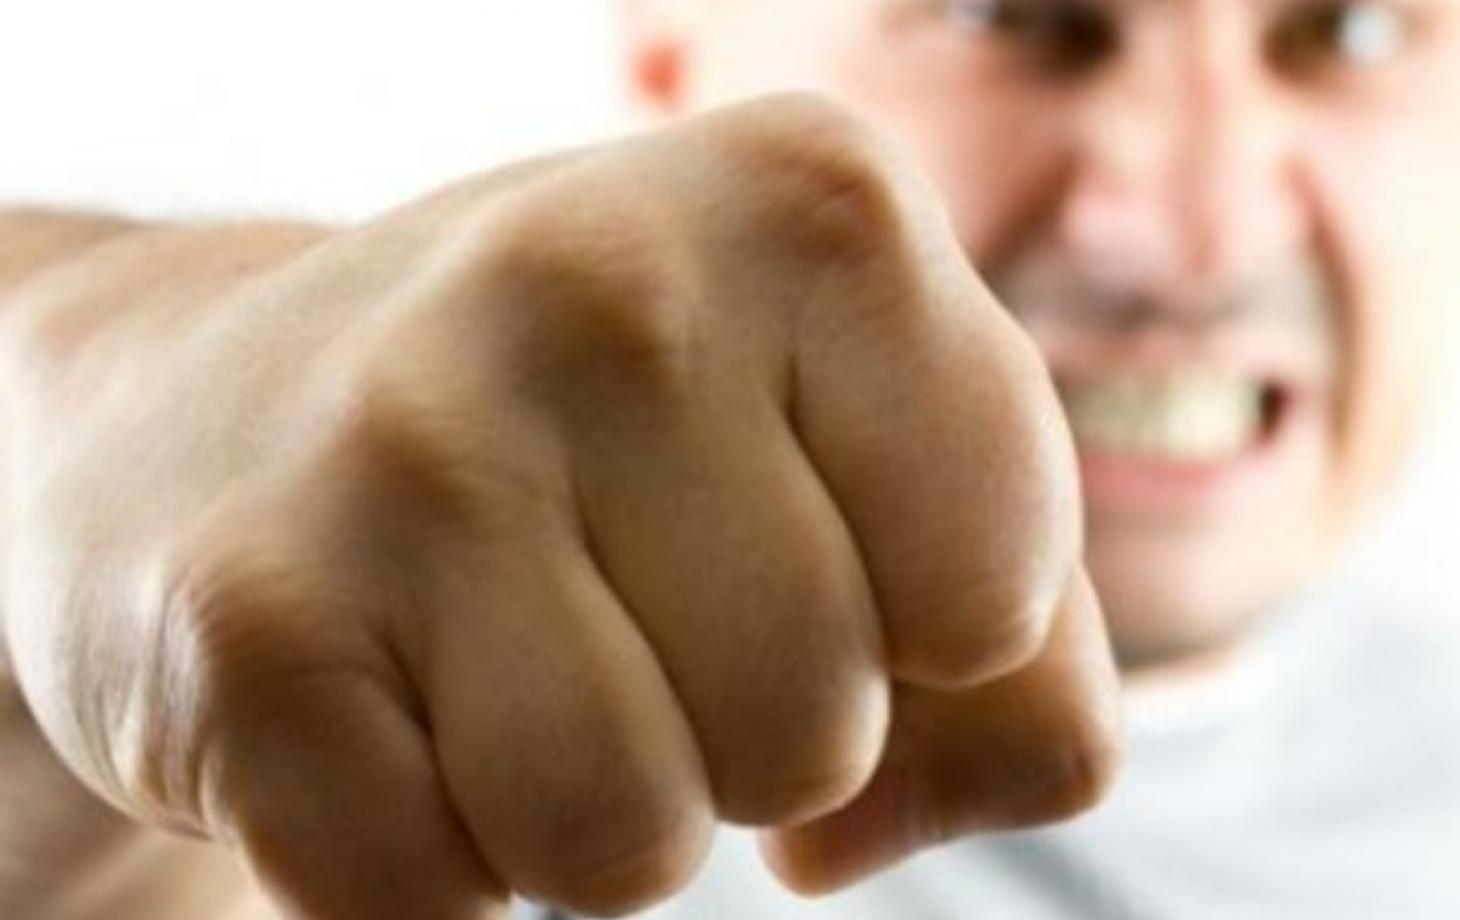 Житель Кіровоградщини позбувся зуба через 280 гривень